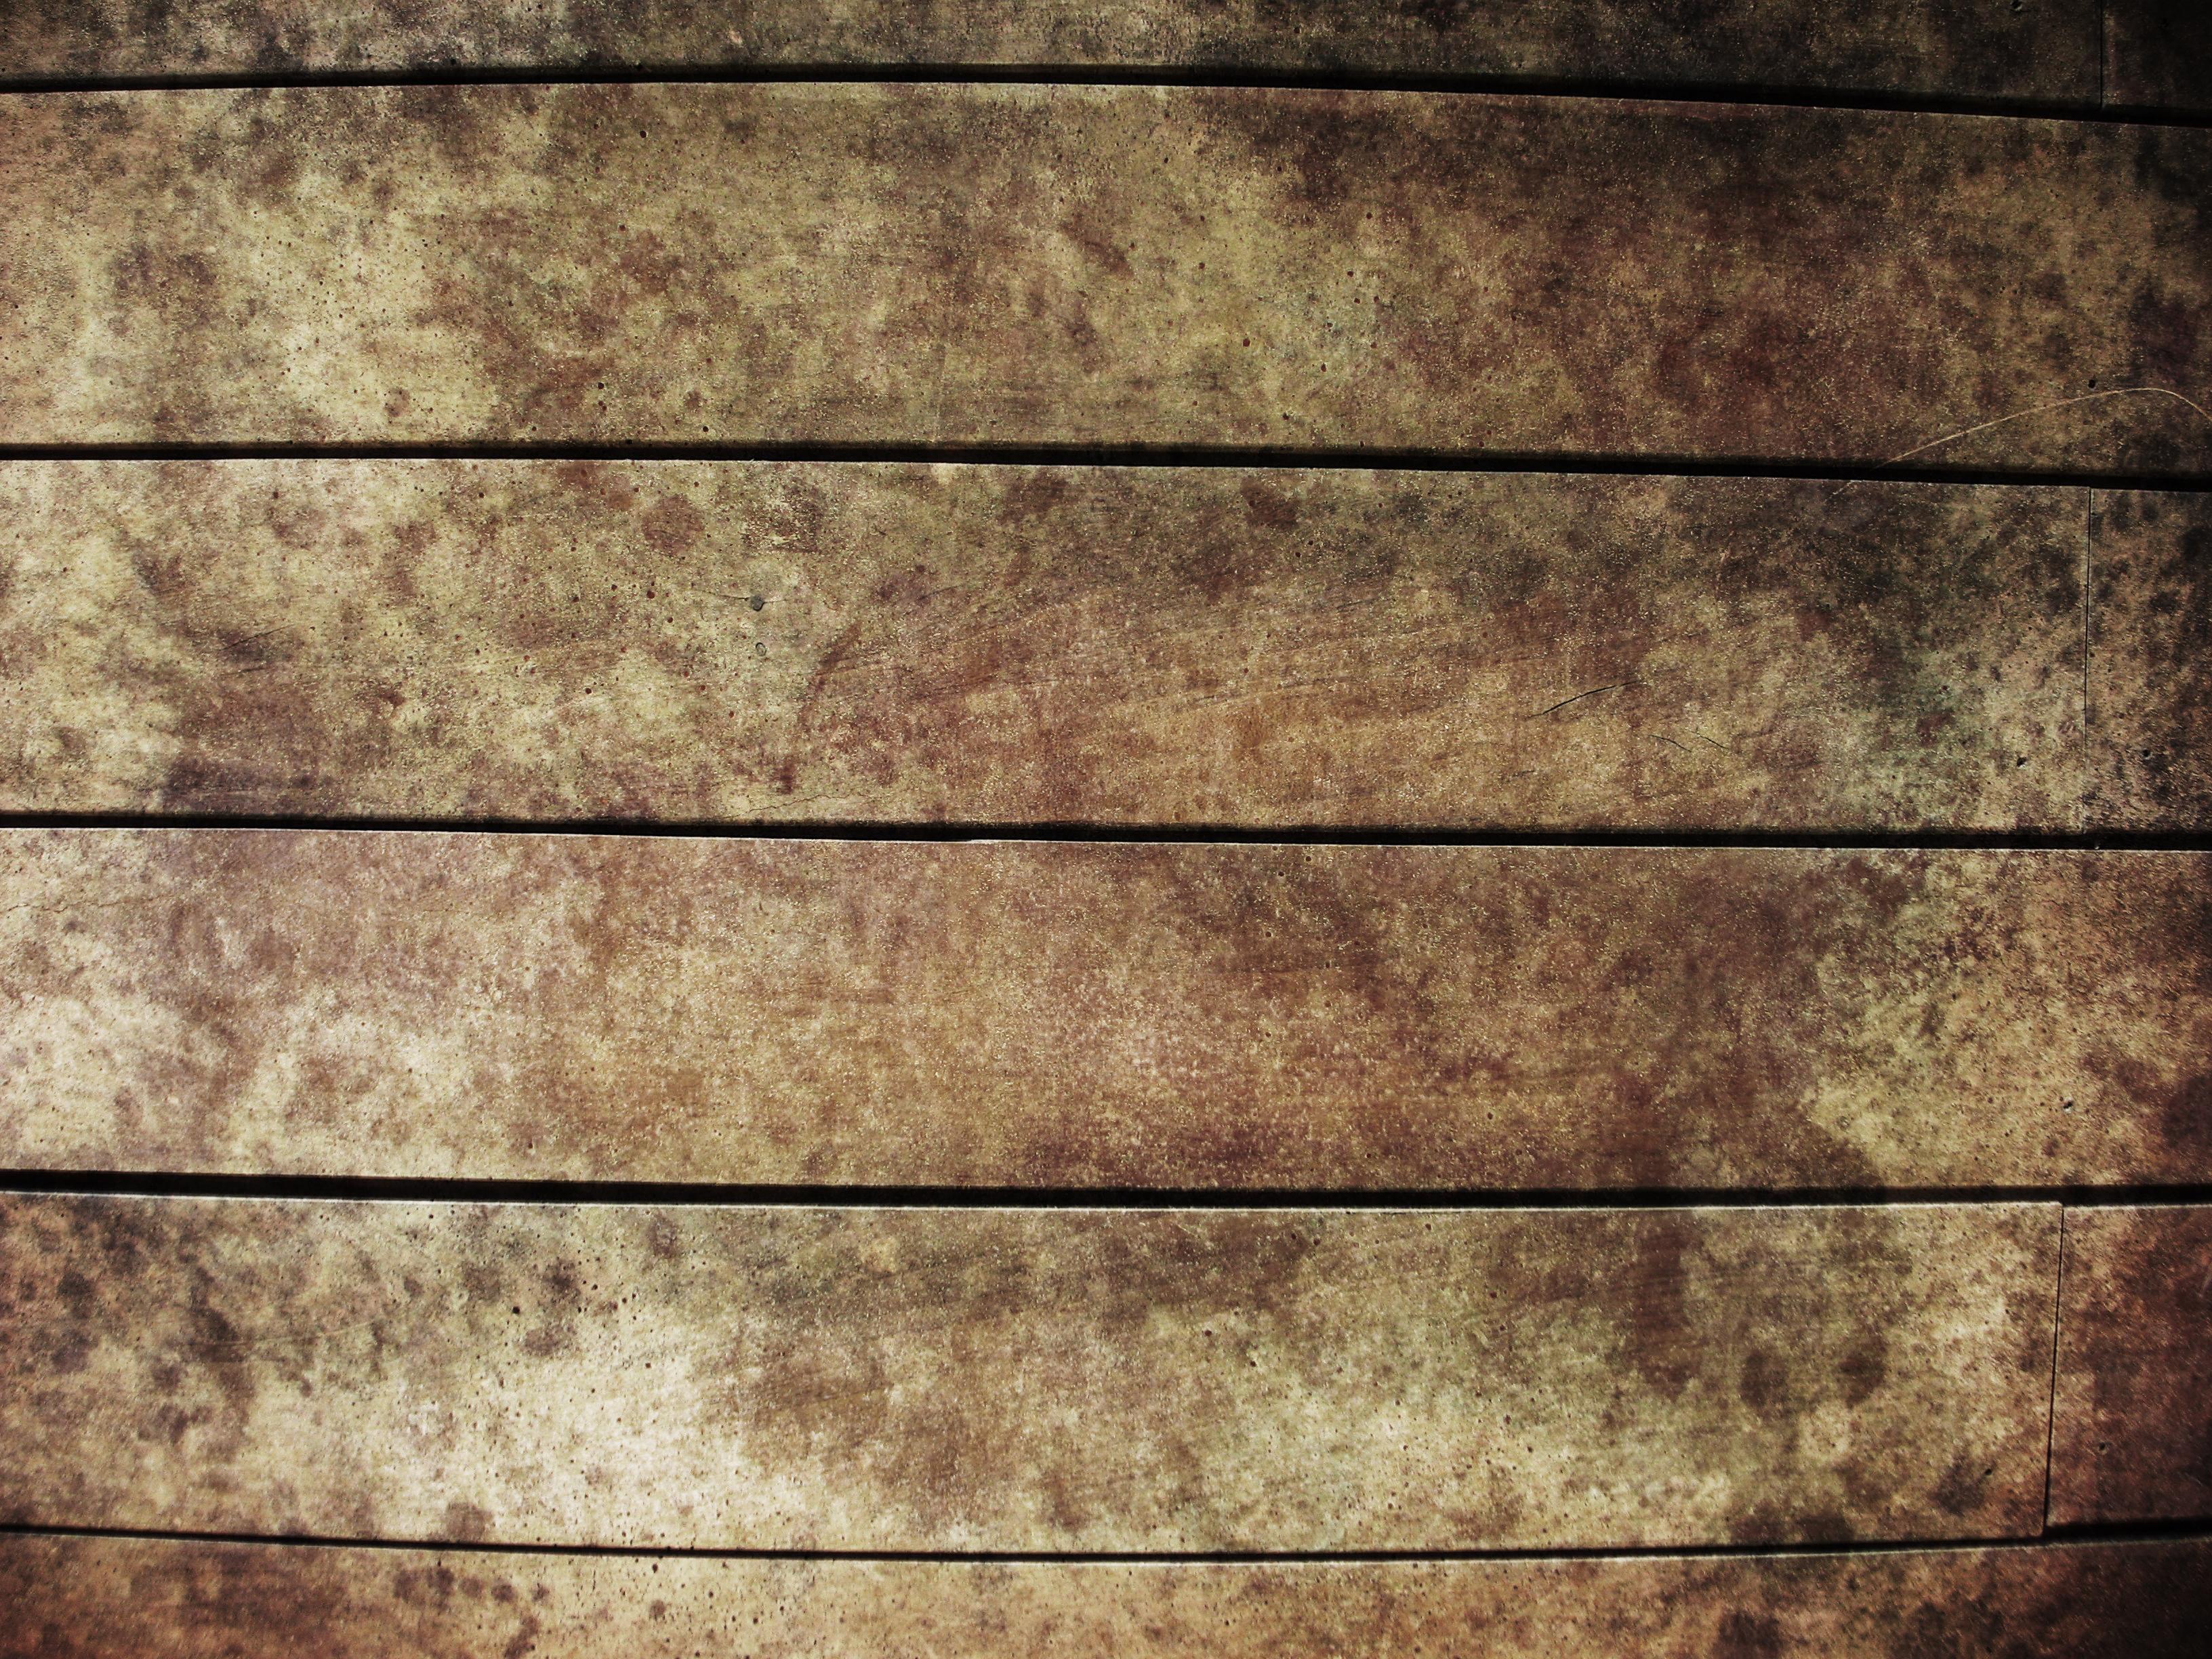 Grungy Wood Texture, Backdrop, Rough, Natural, Oak, HQ Photo